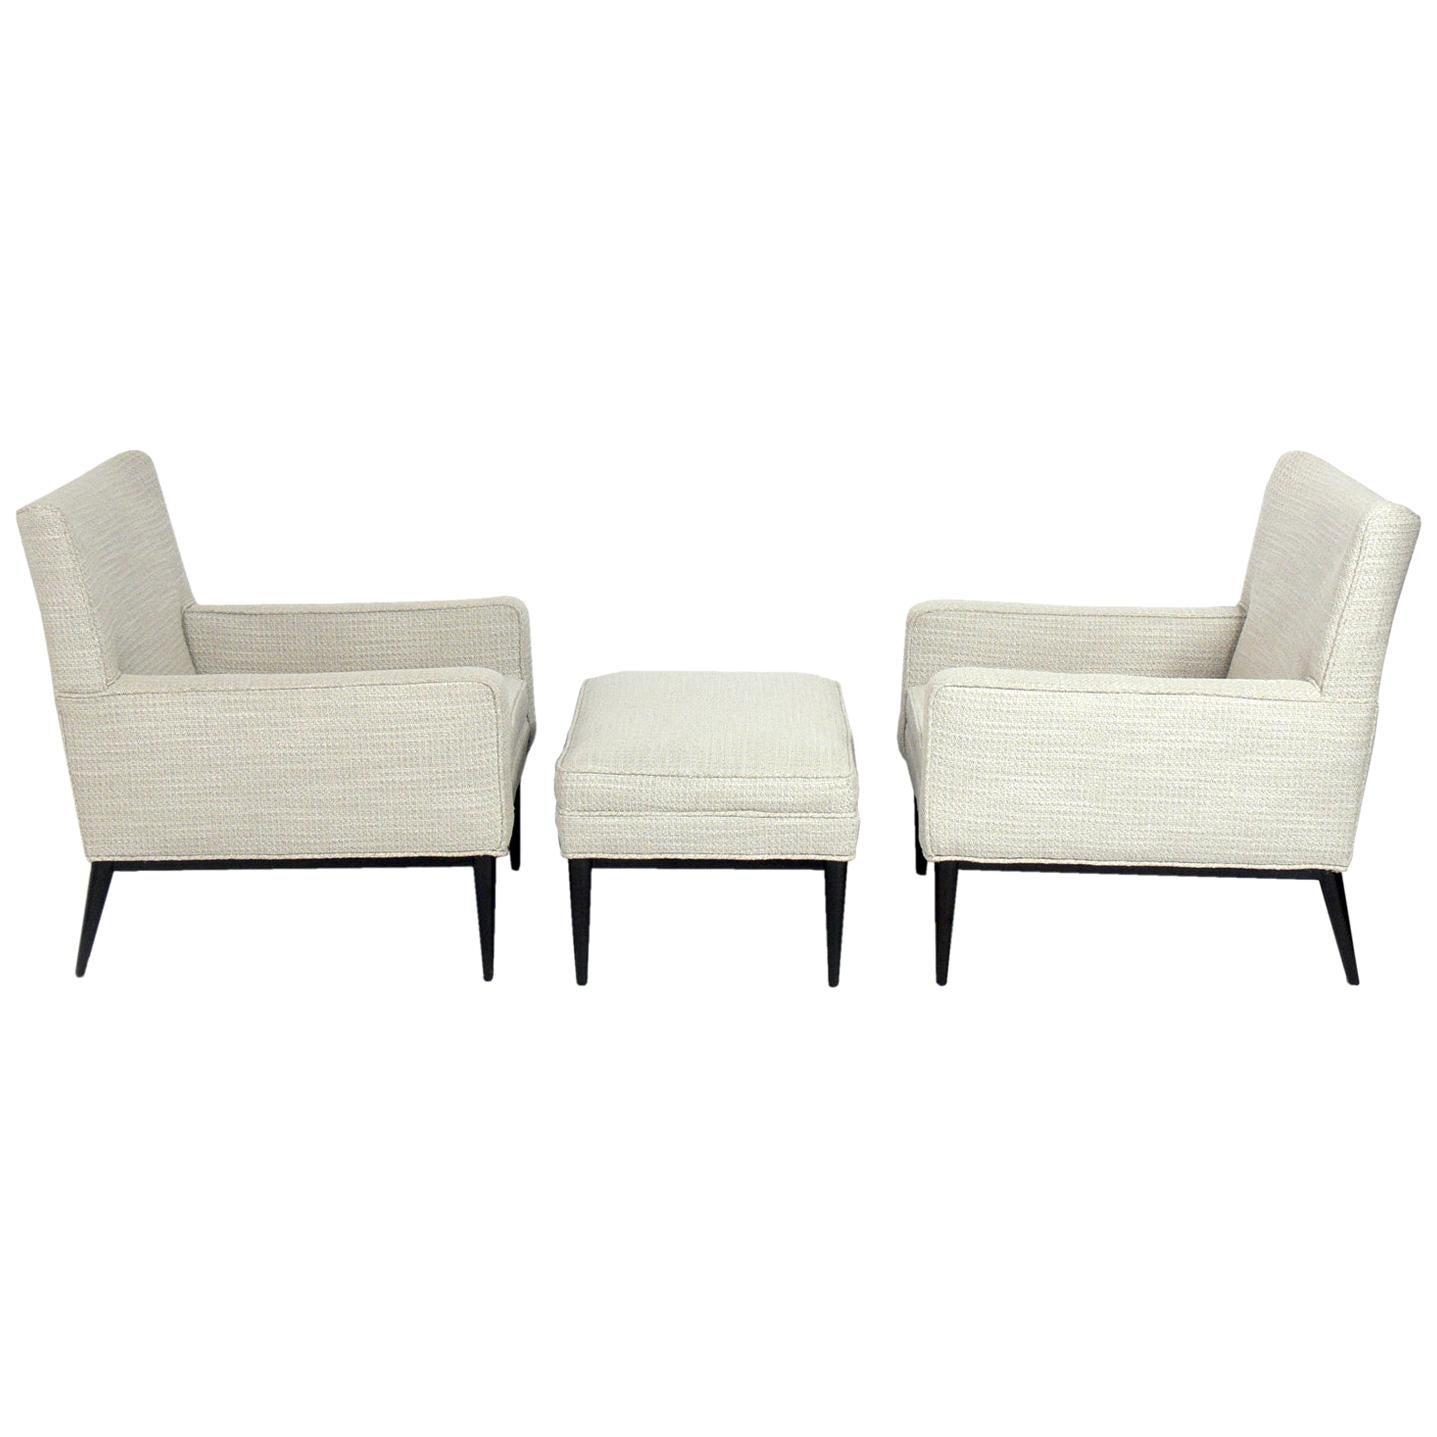 Paul McCobb Lounge Chairs and Ottoman